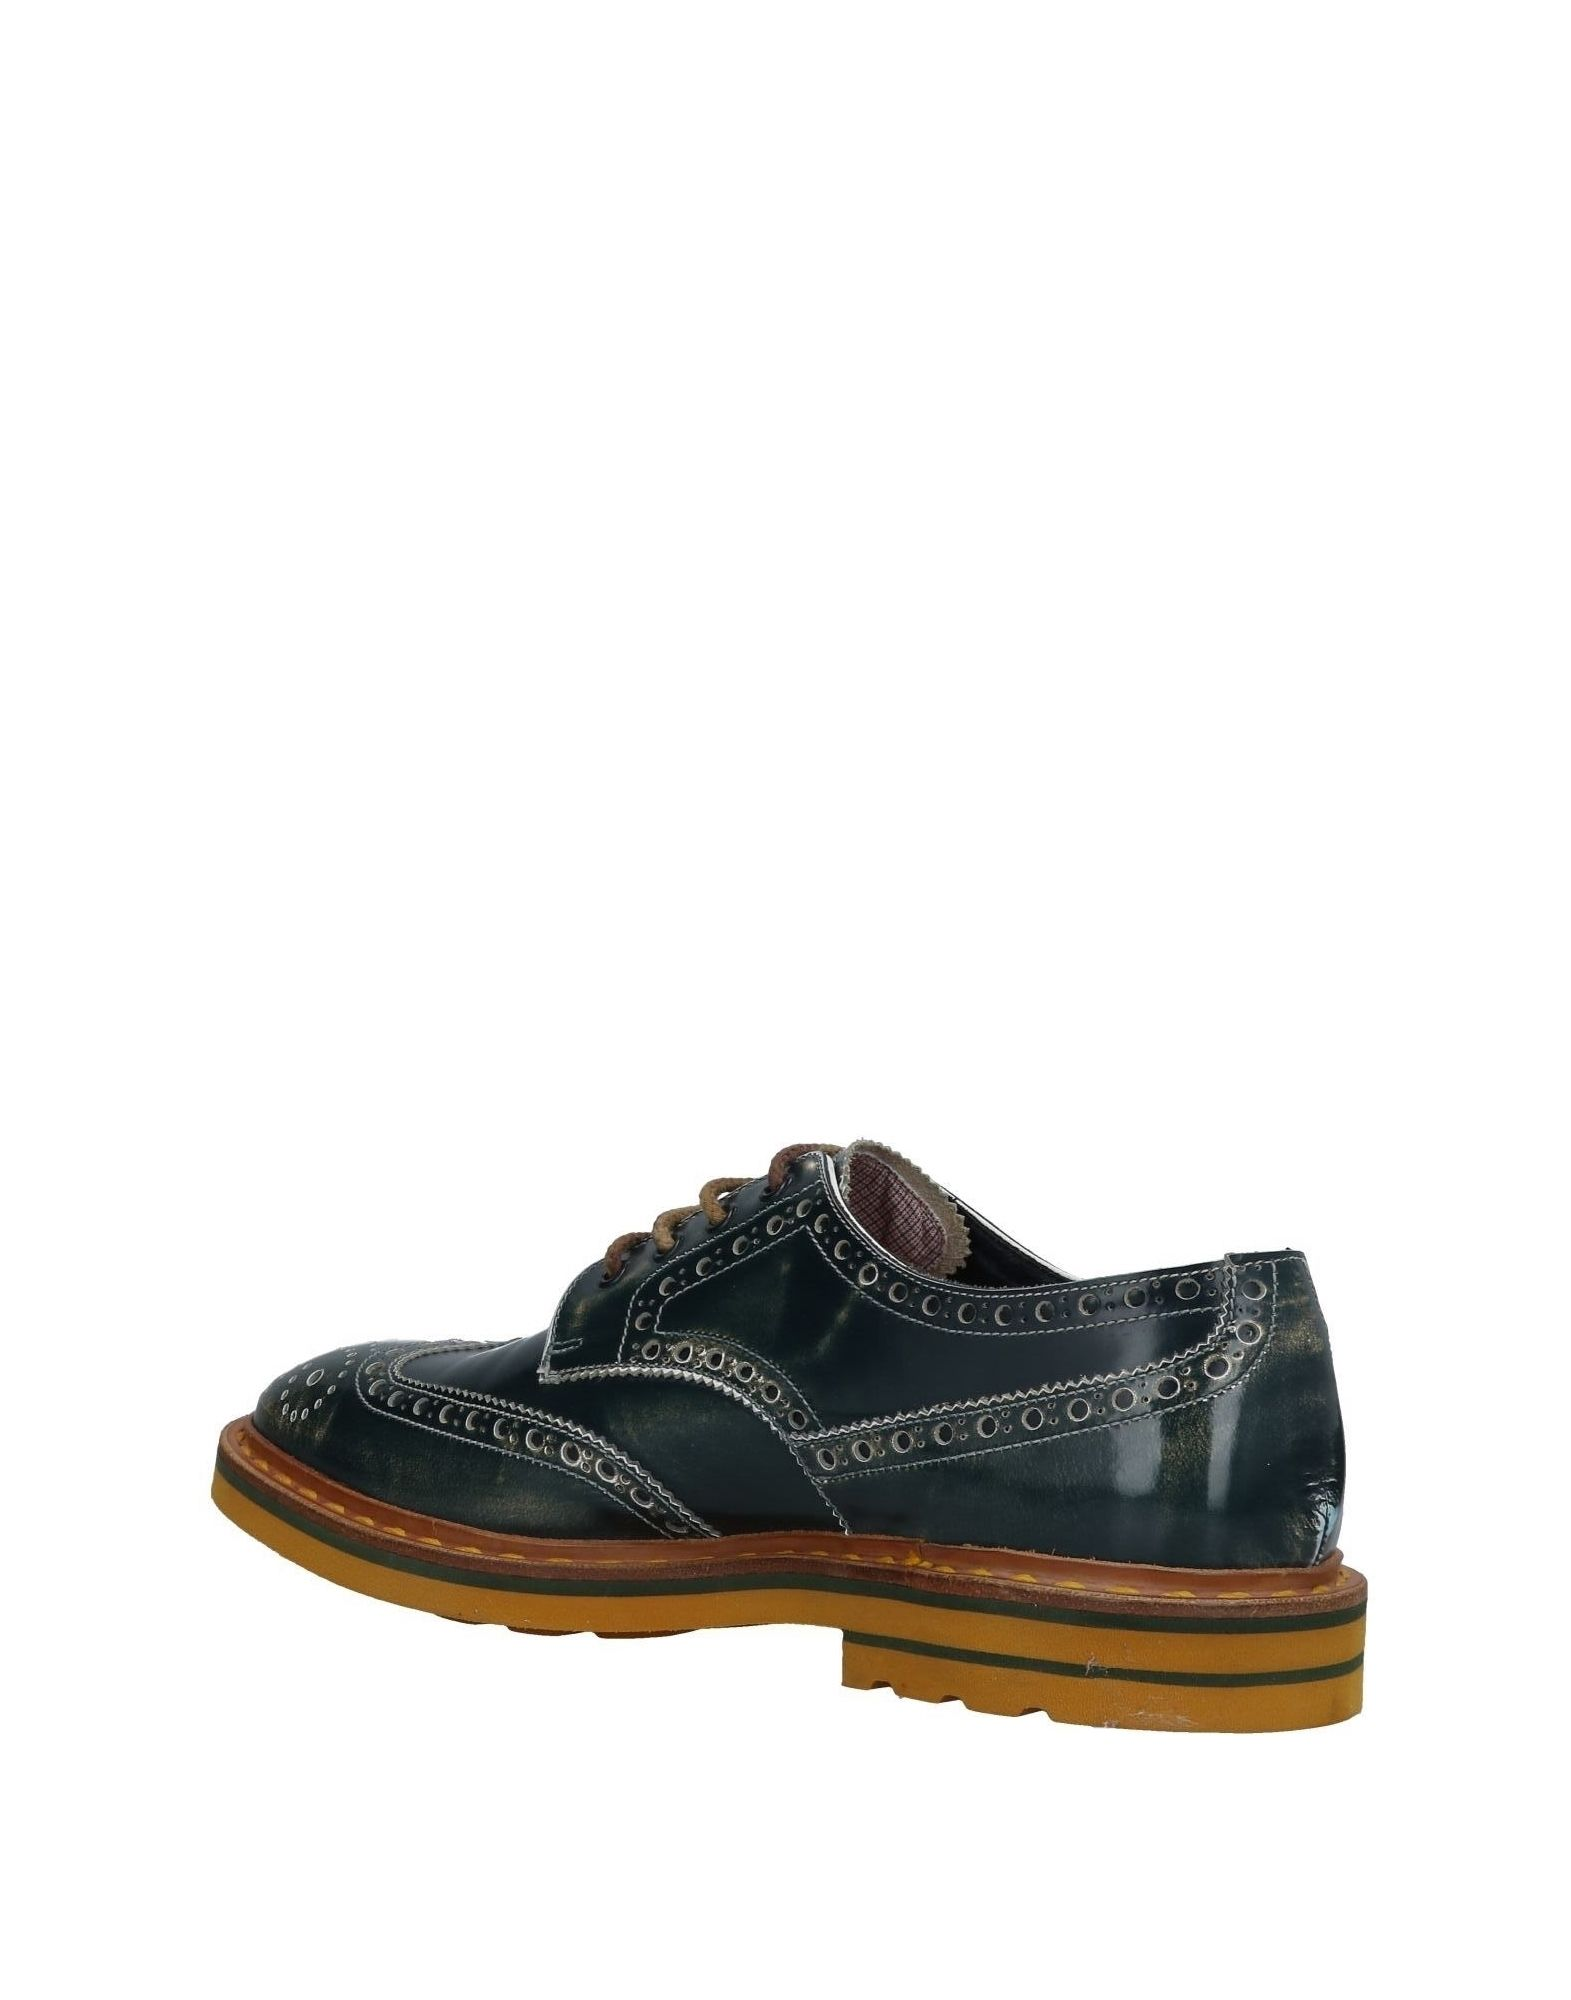 Chaussures À Lacets Barracuda Homme - Chaussures À Lacets Barracuda sur